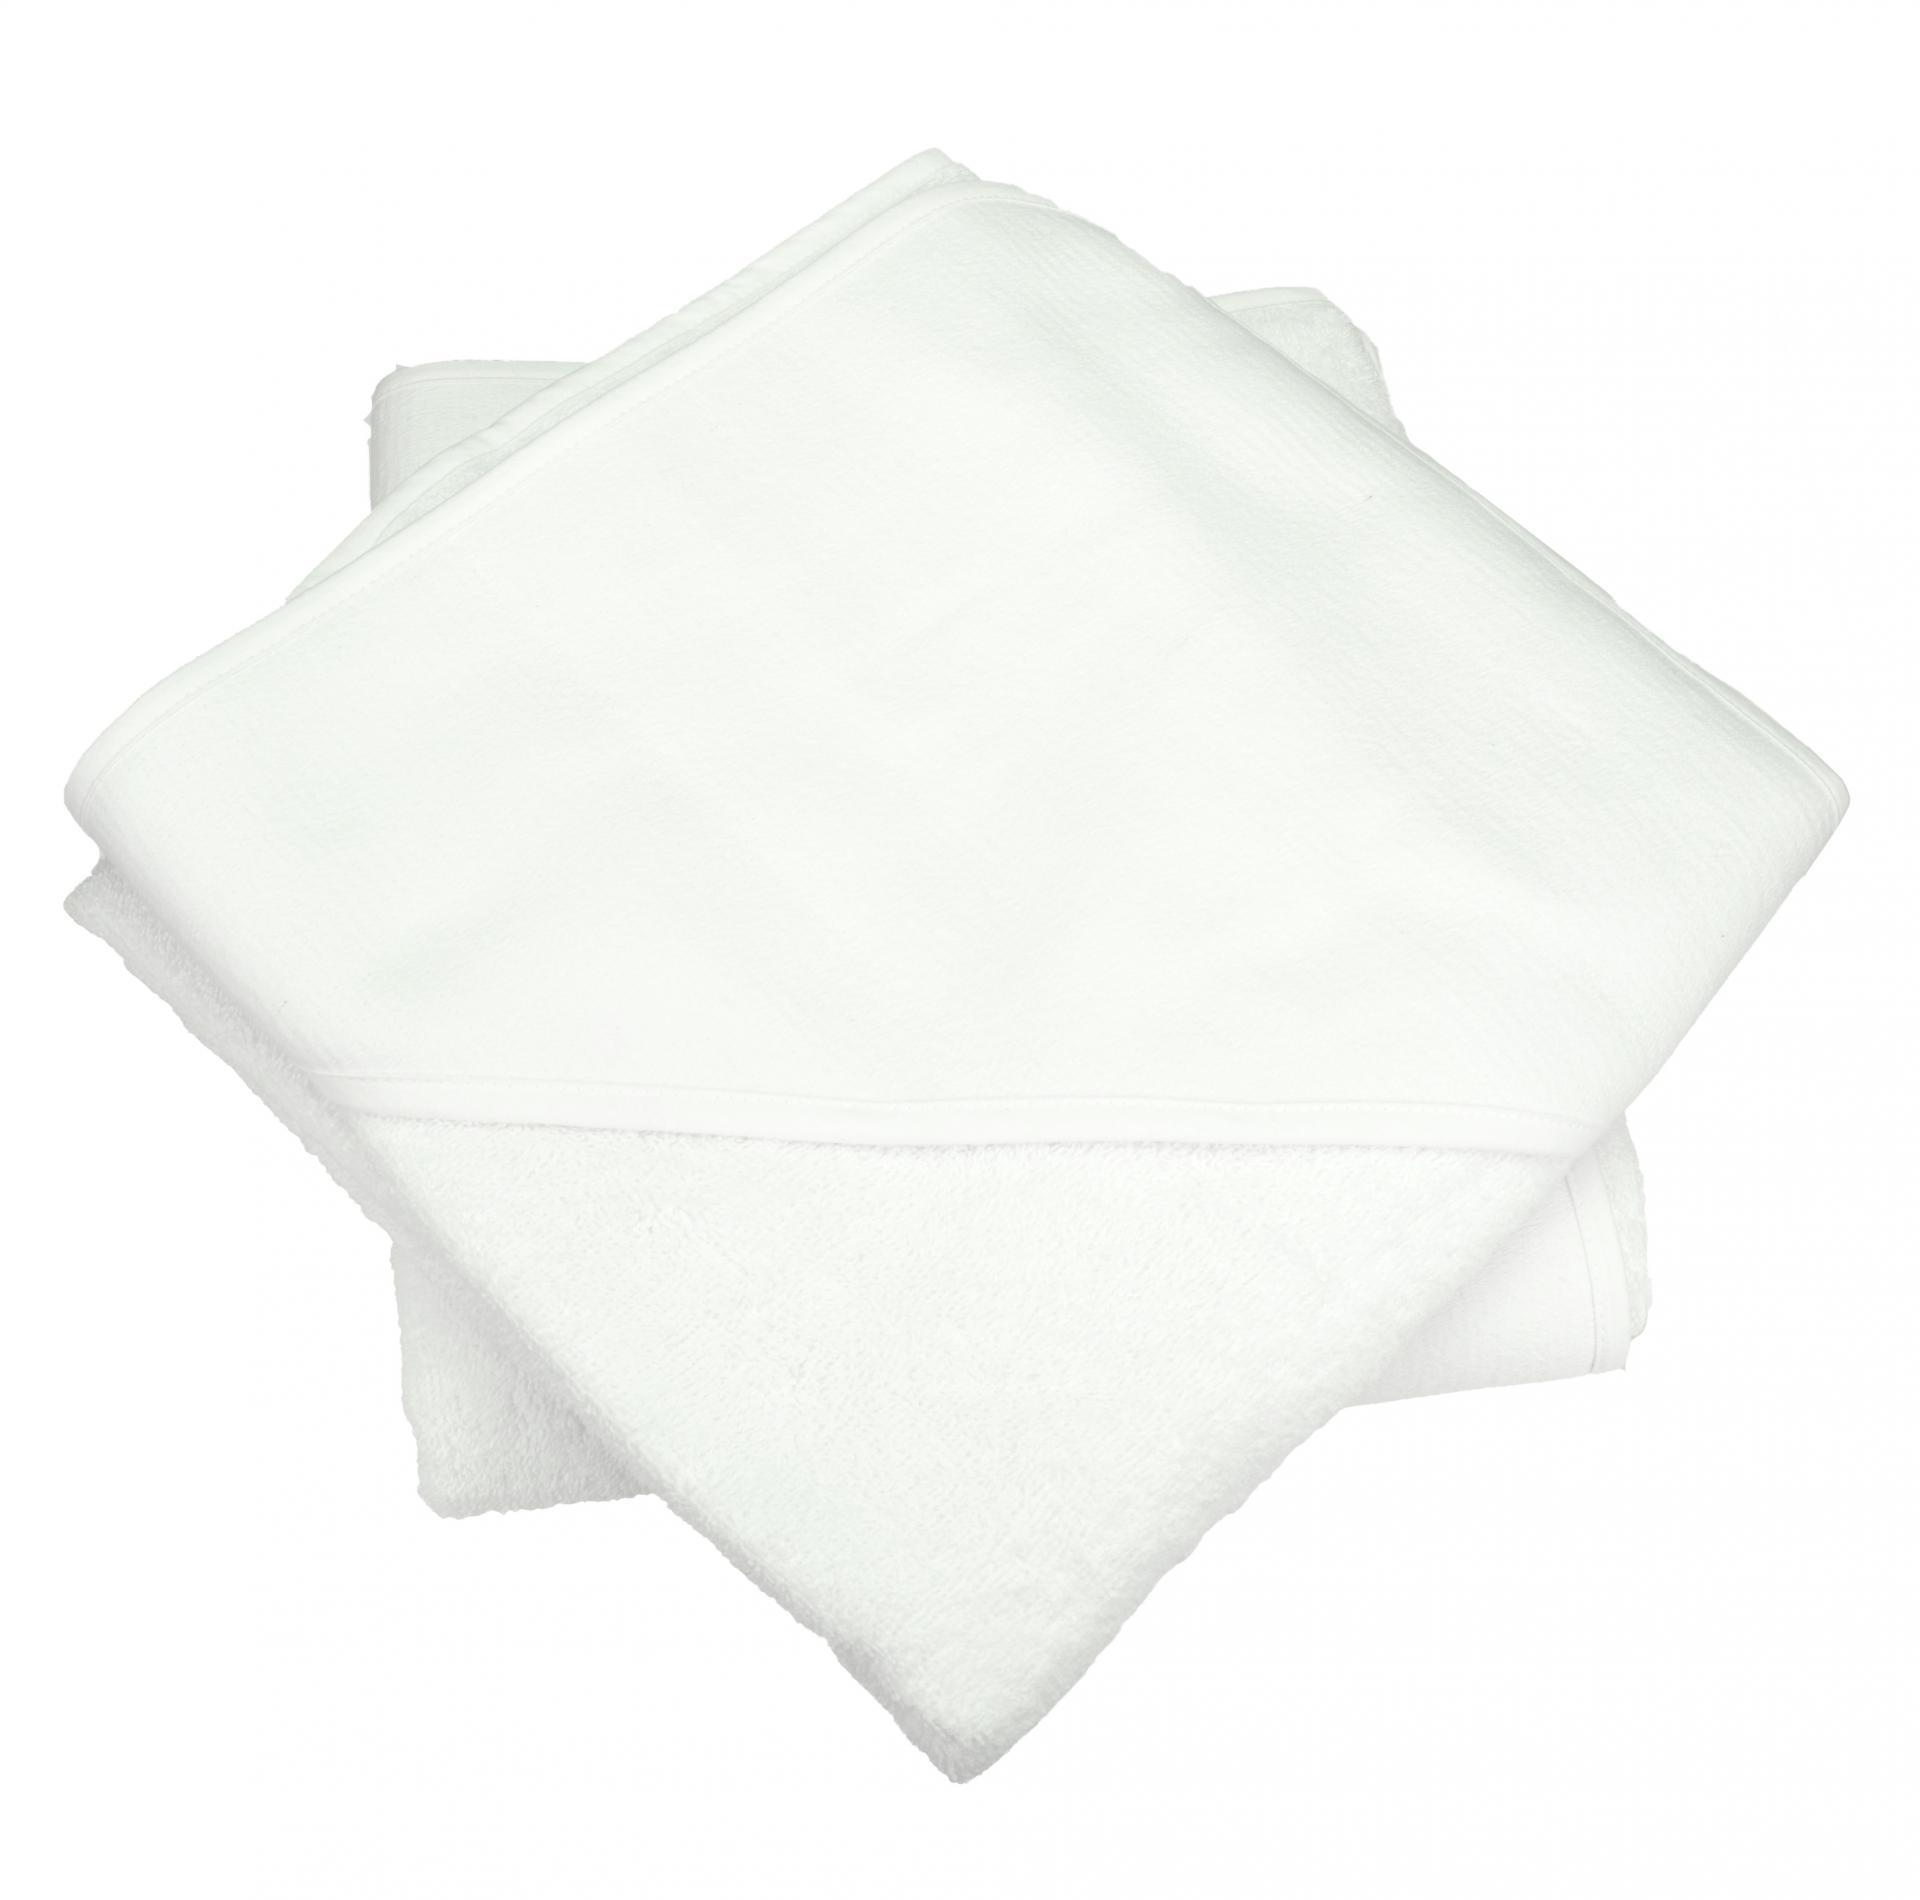 Ar732 white white ft